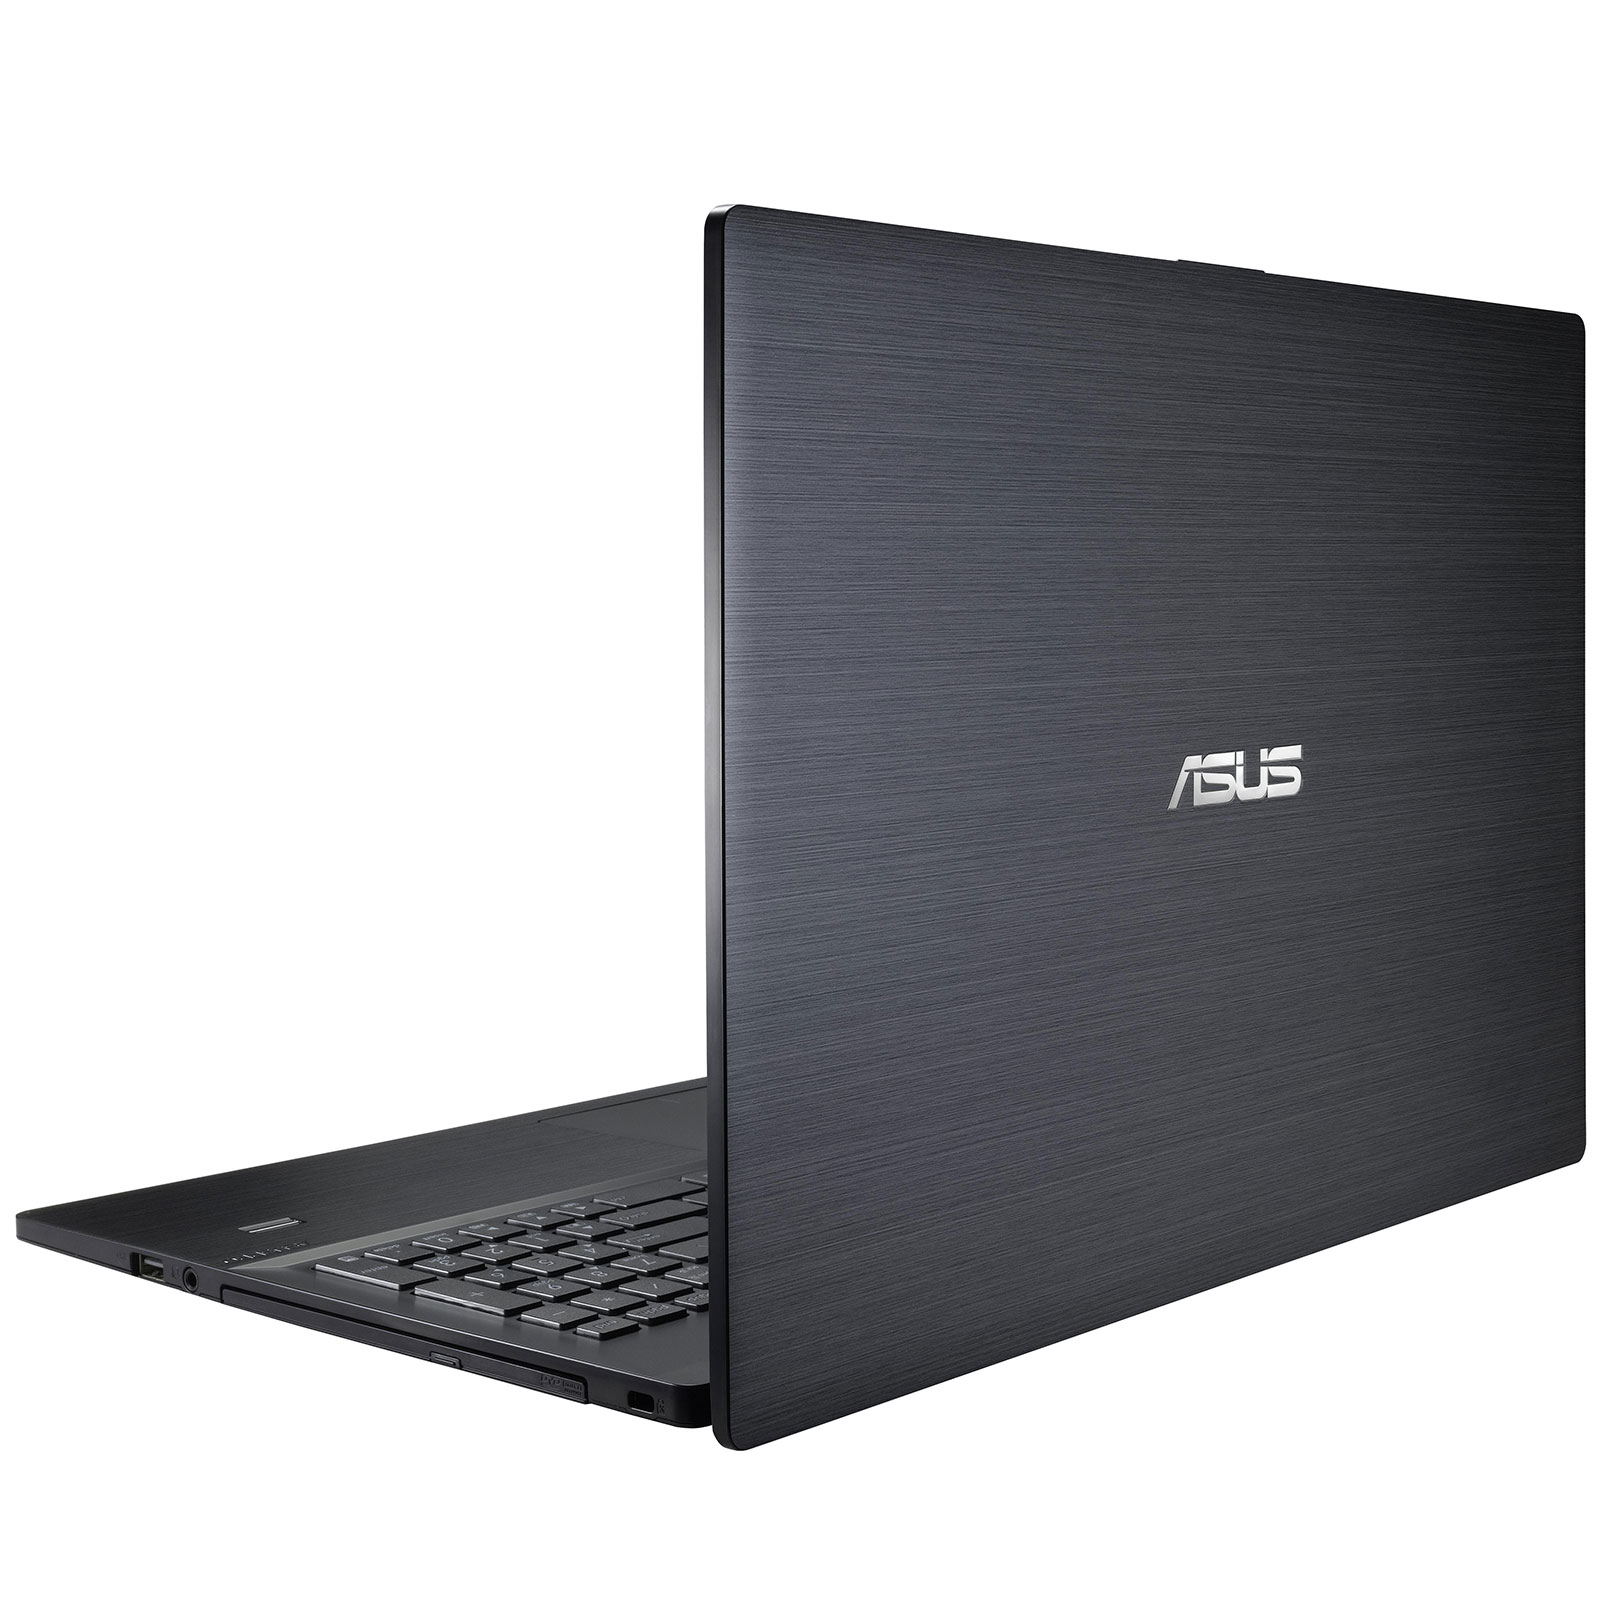 Asus P2530UA-XO0178RB - PC portable Asus - Cybertek.fr - 2